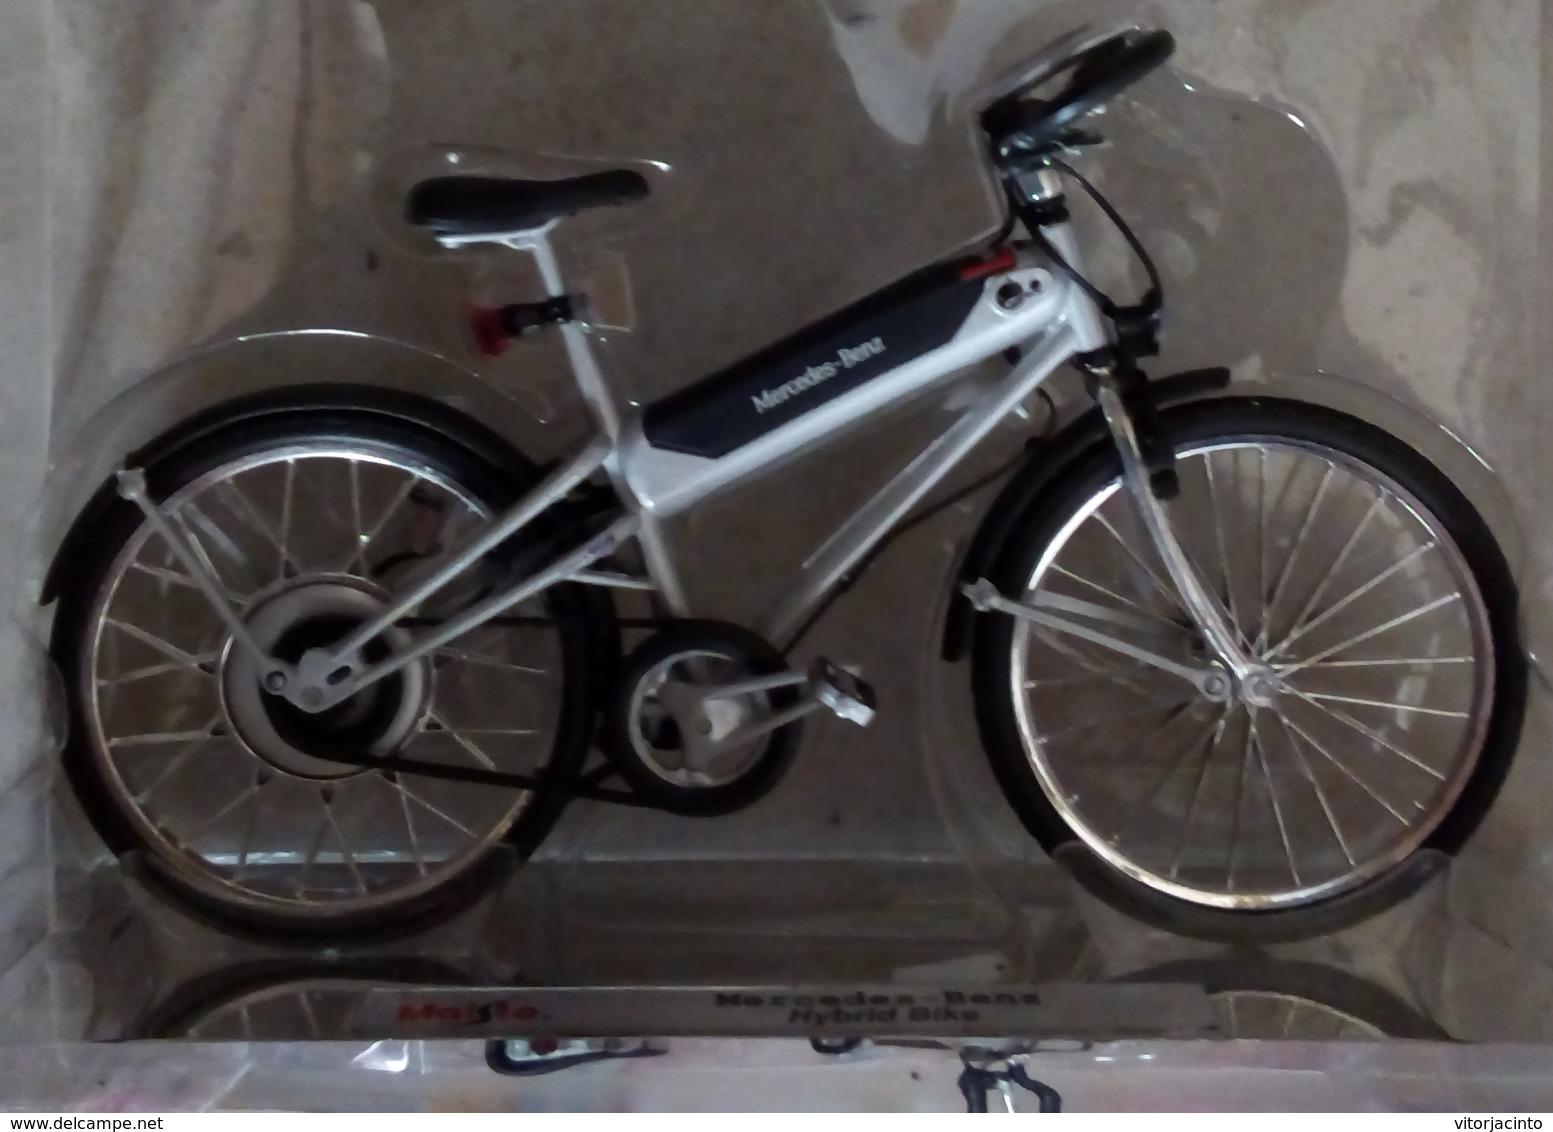 Bicycle - Mercedes-Benz (Hybrid Bike) - Motos